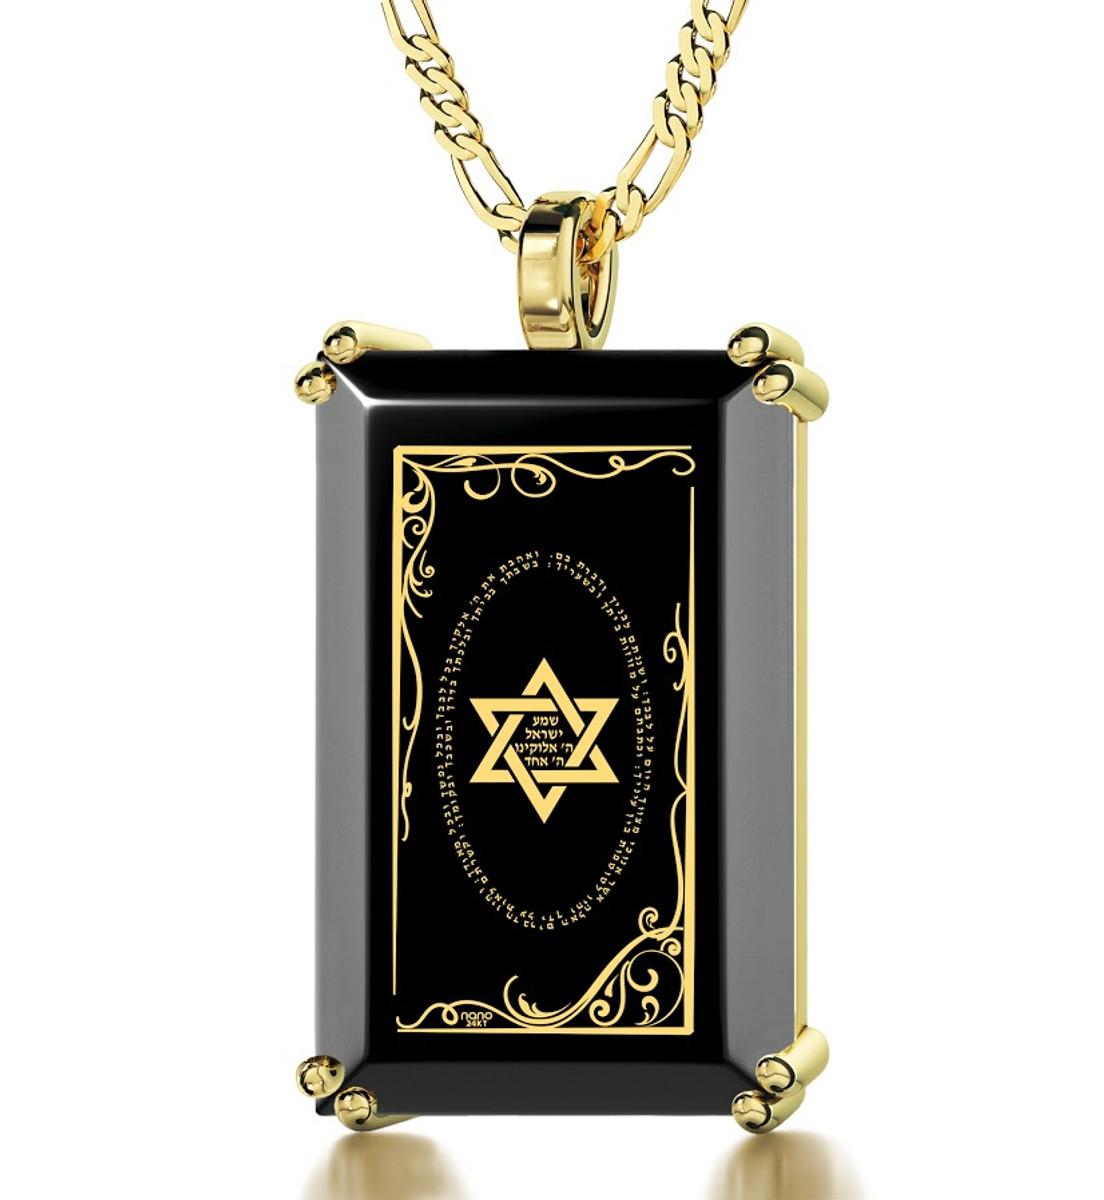 Black Inspirational Jewelry Gold RectangleStar of David Necklace